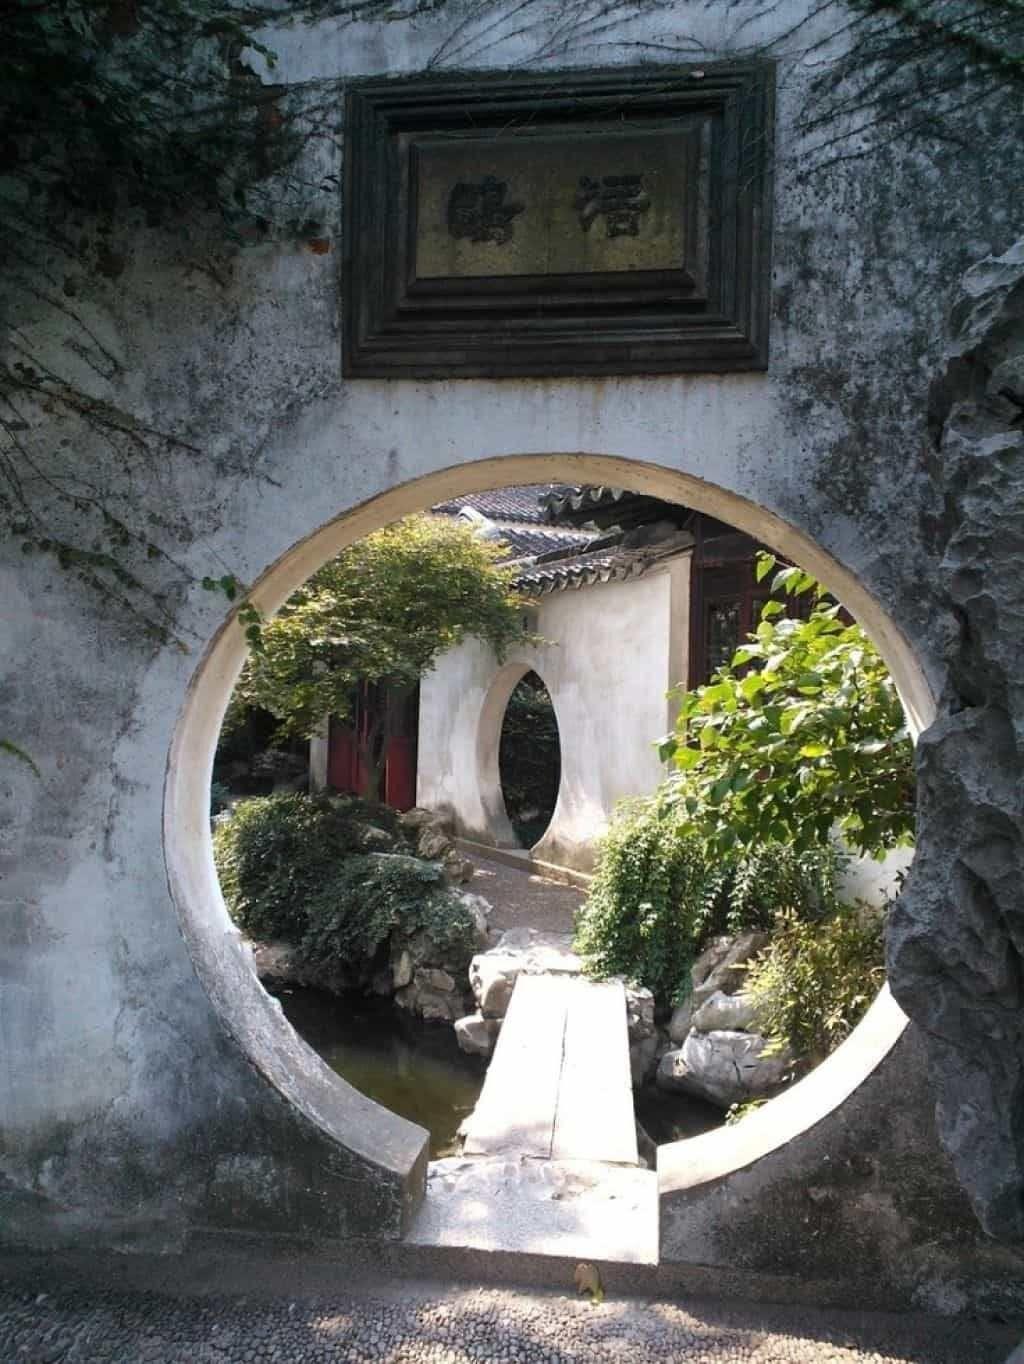 4 Nice chinese garden design for your backyard -   15 garden design Chinese backyards ideas